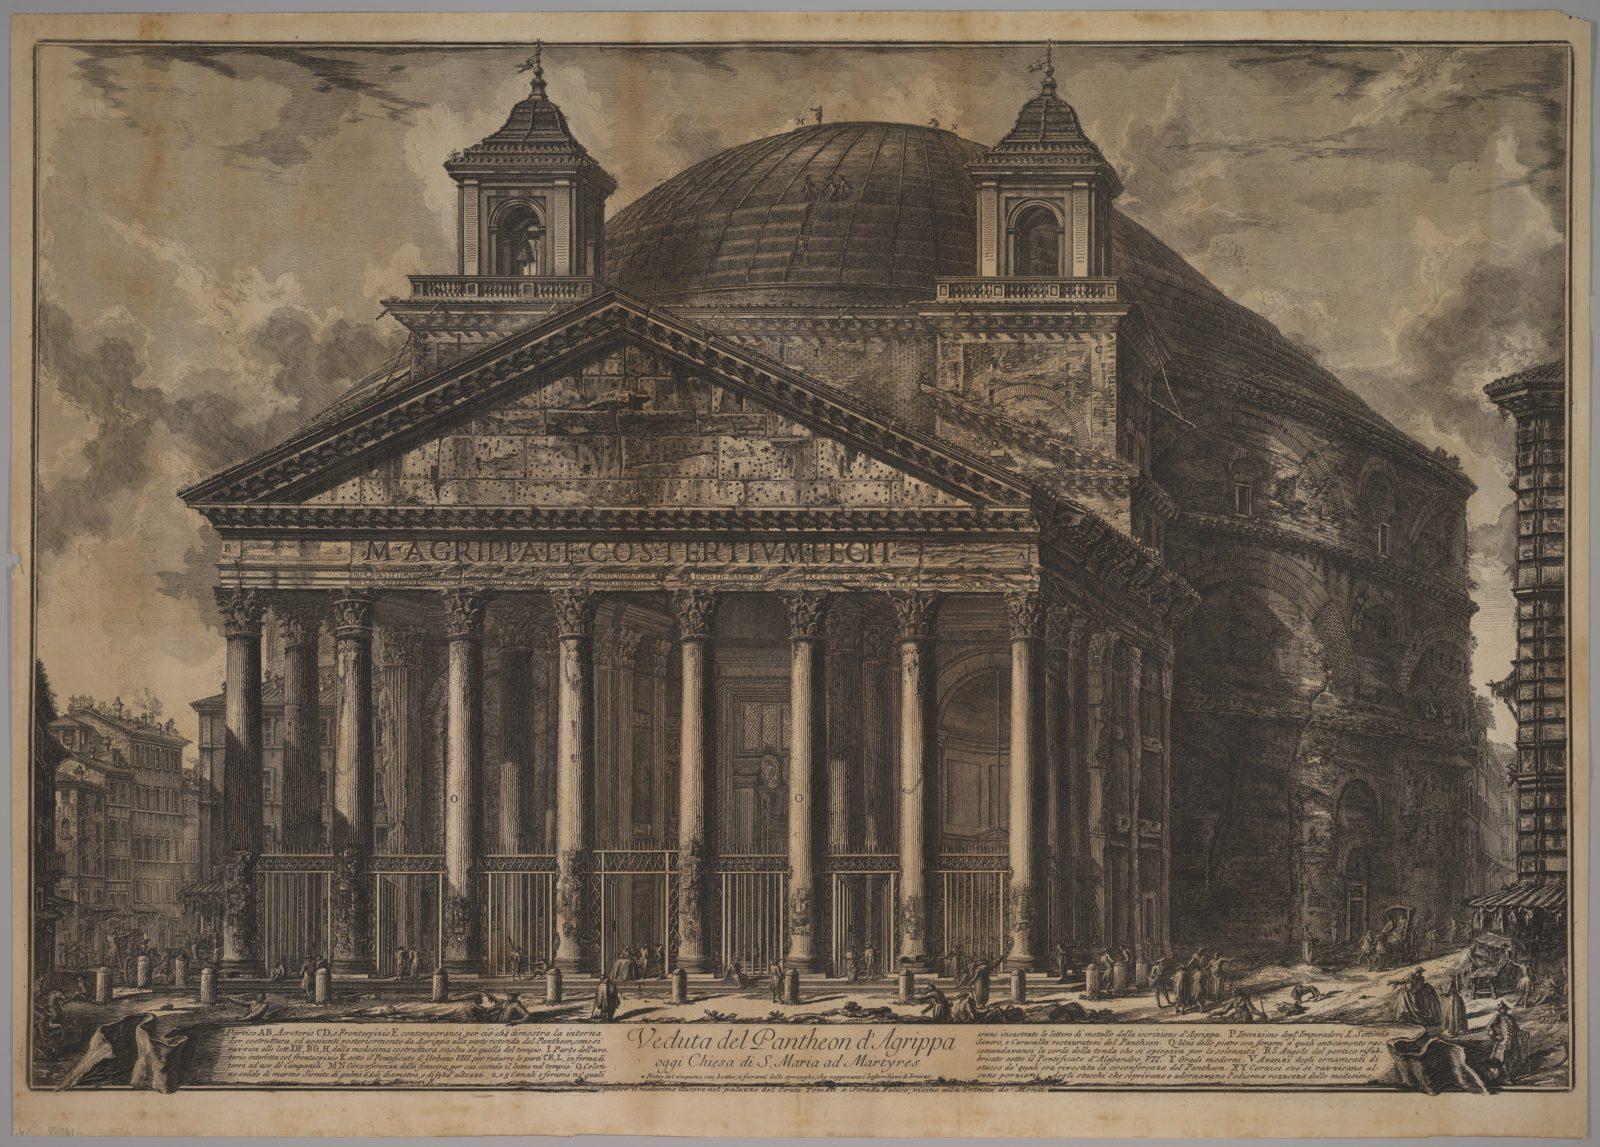 The Pantheon exterior (Veduta del Pantheon d'Agrippa oggi Chiesa di S. Maria ad Martyres)